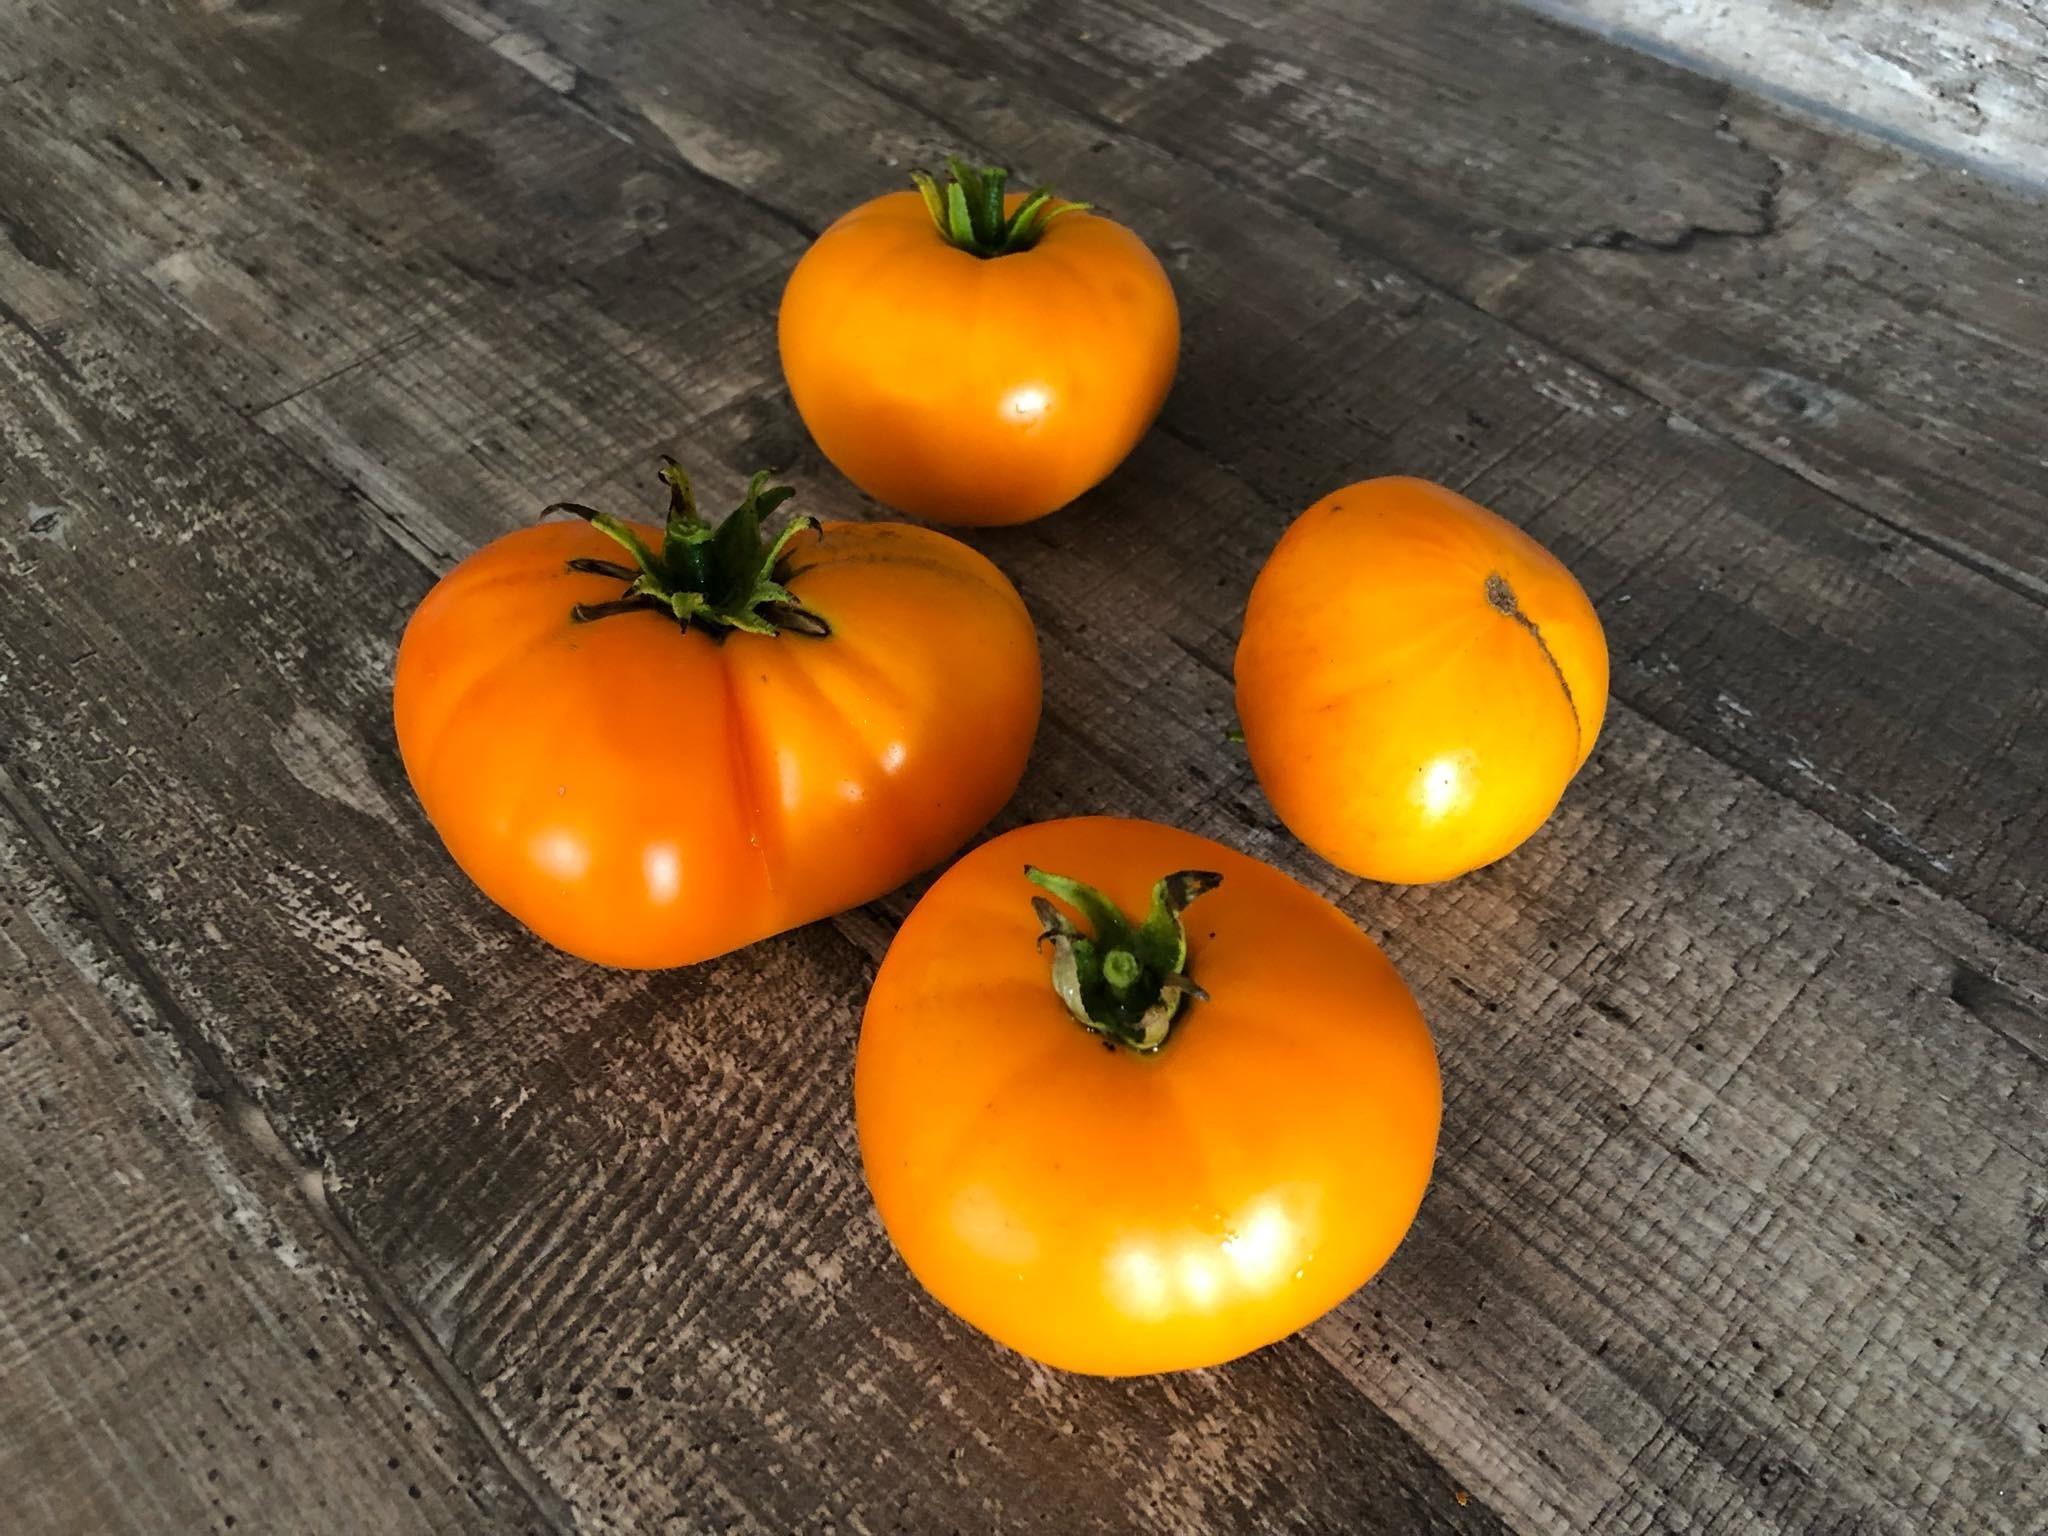 Tomate Apelsin 10 Samen